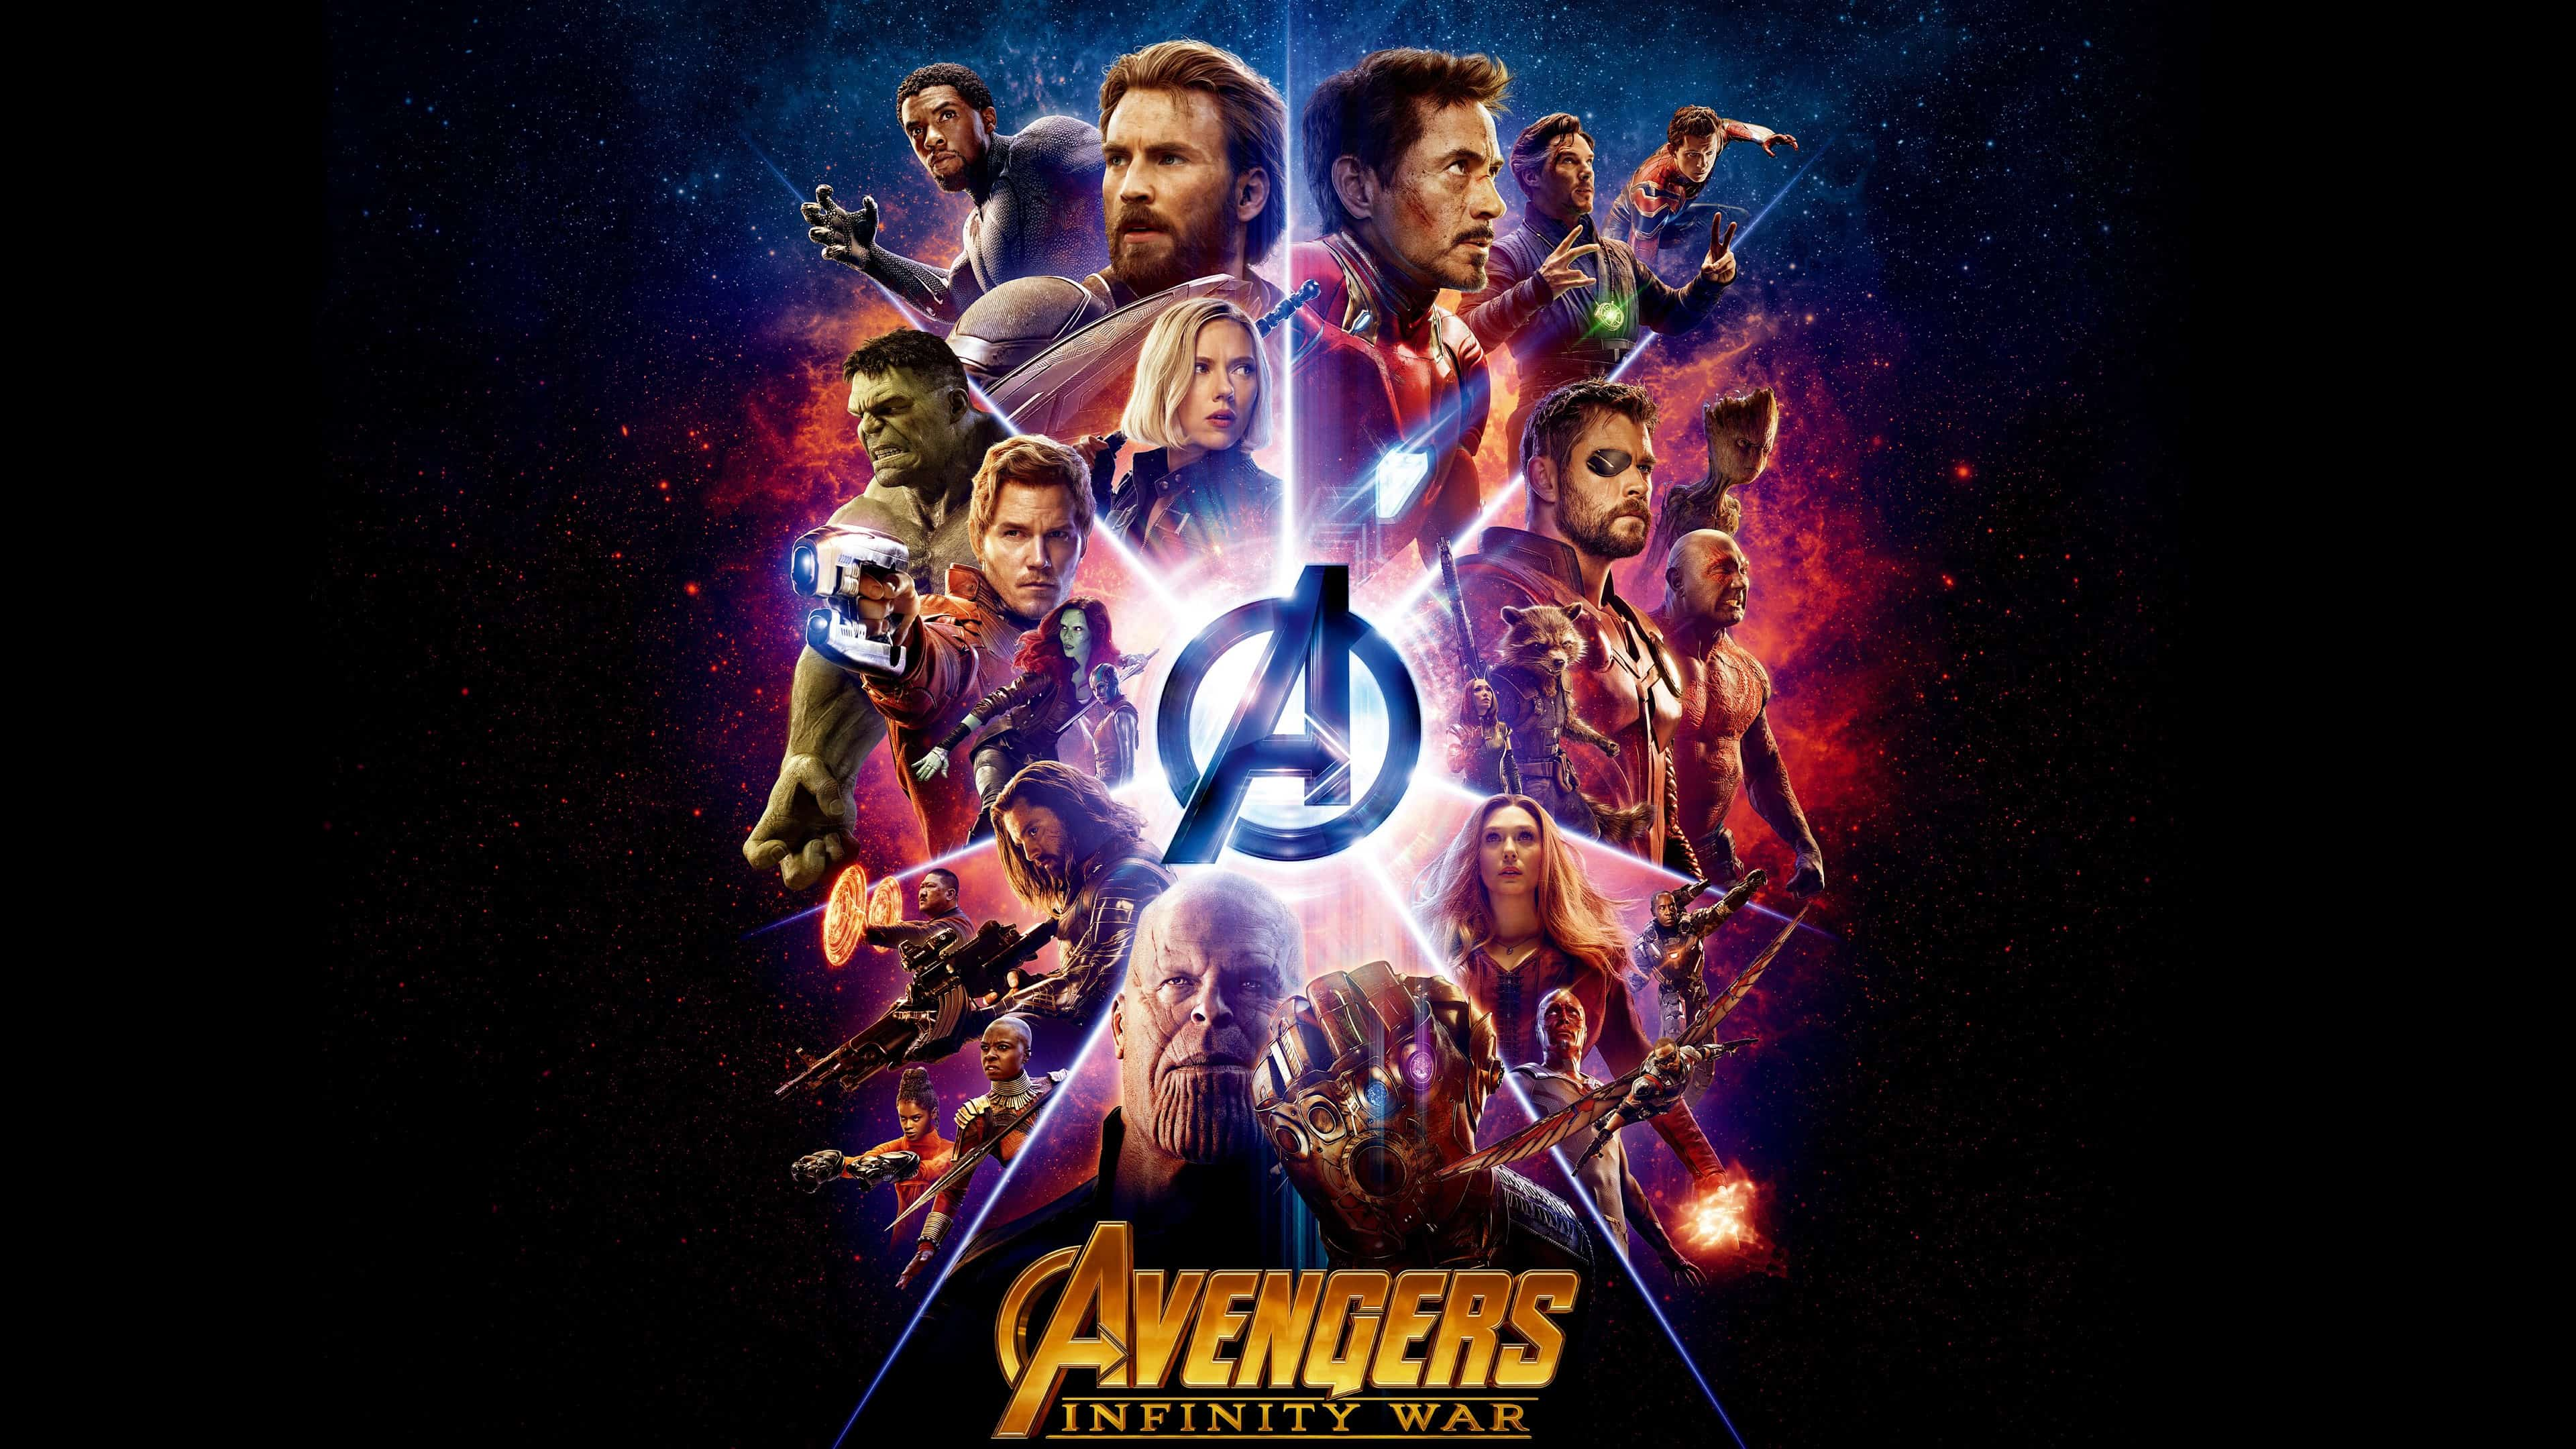 avengers infinity war poster uhd 4k wallpaper